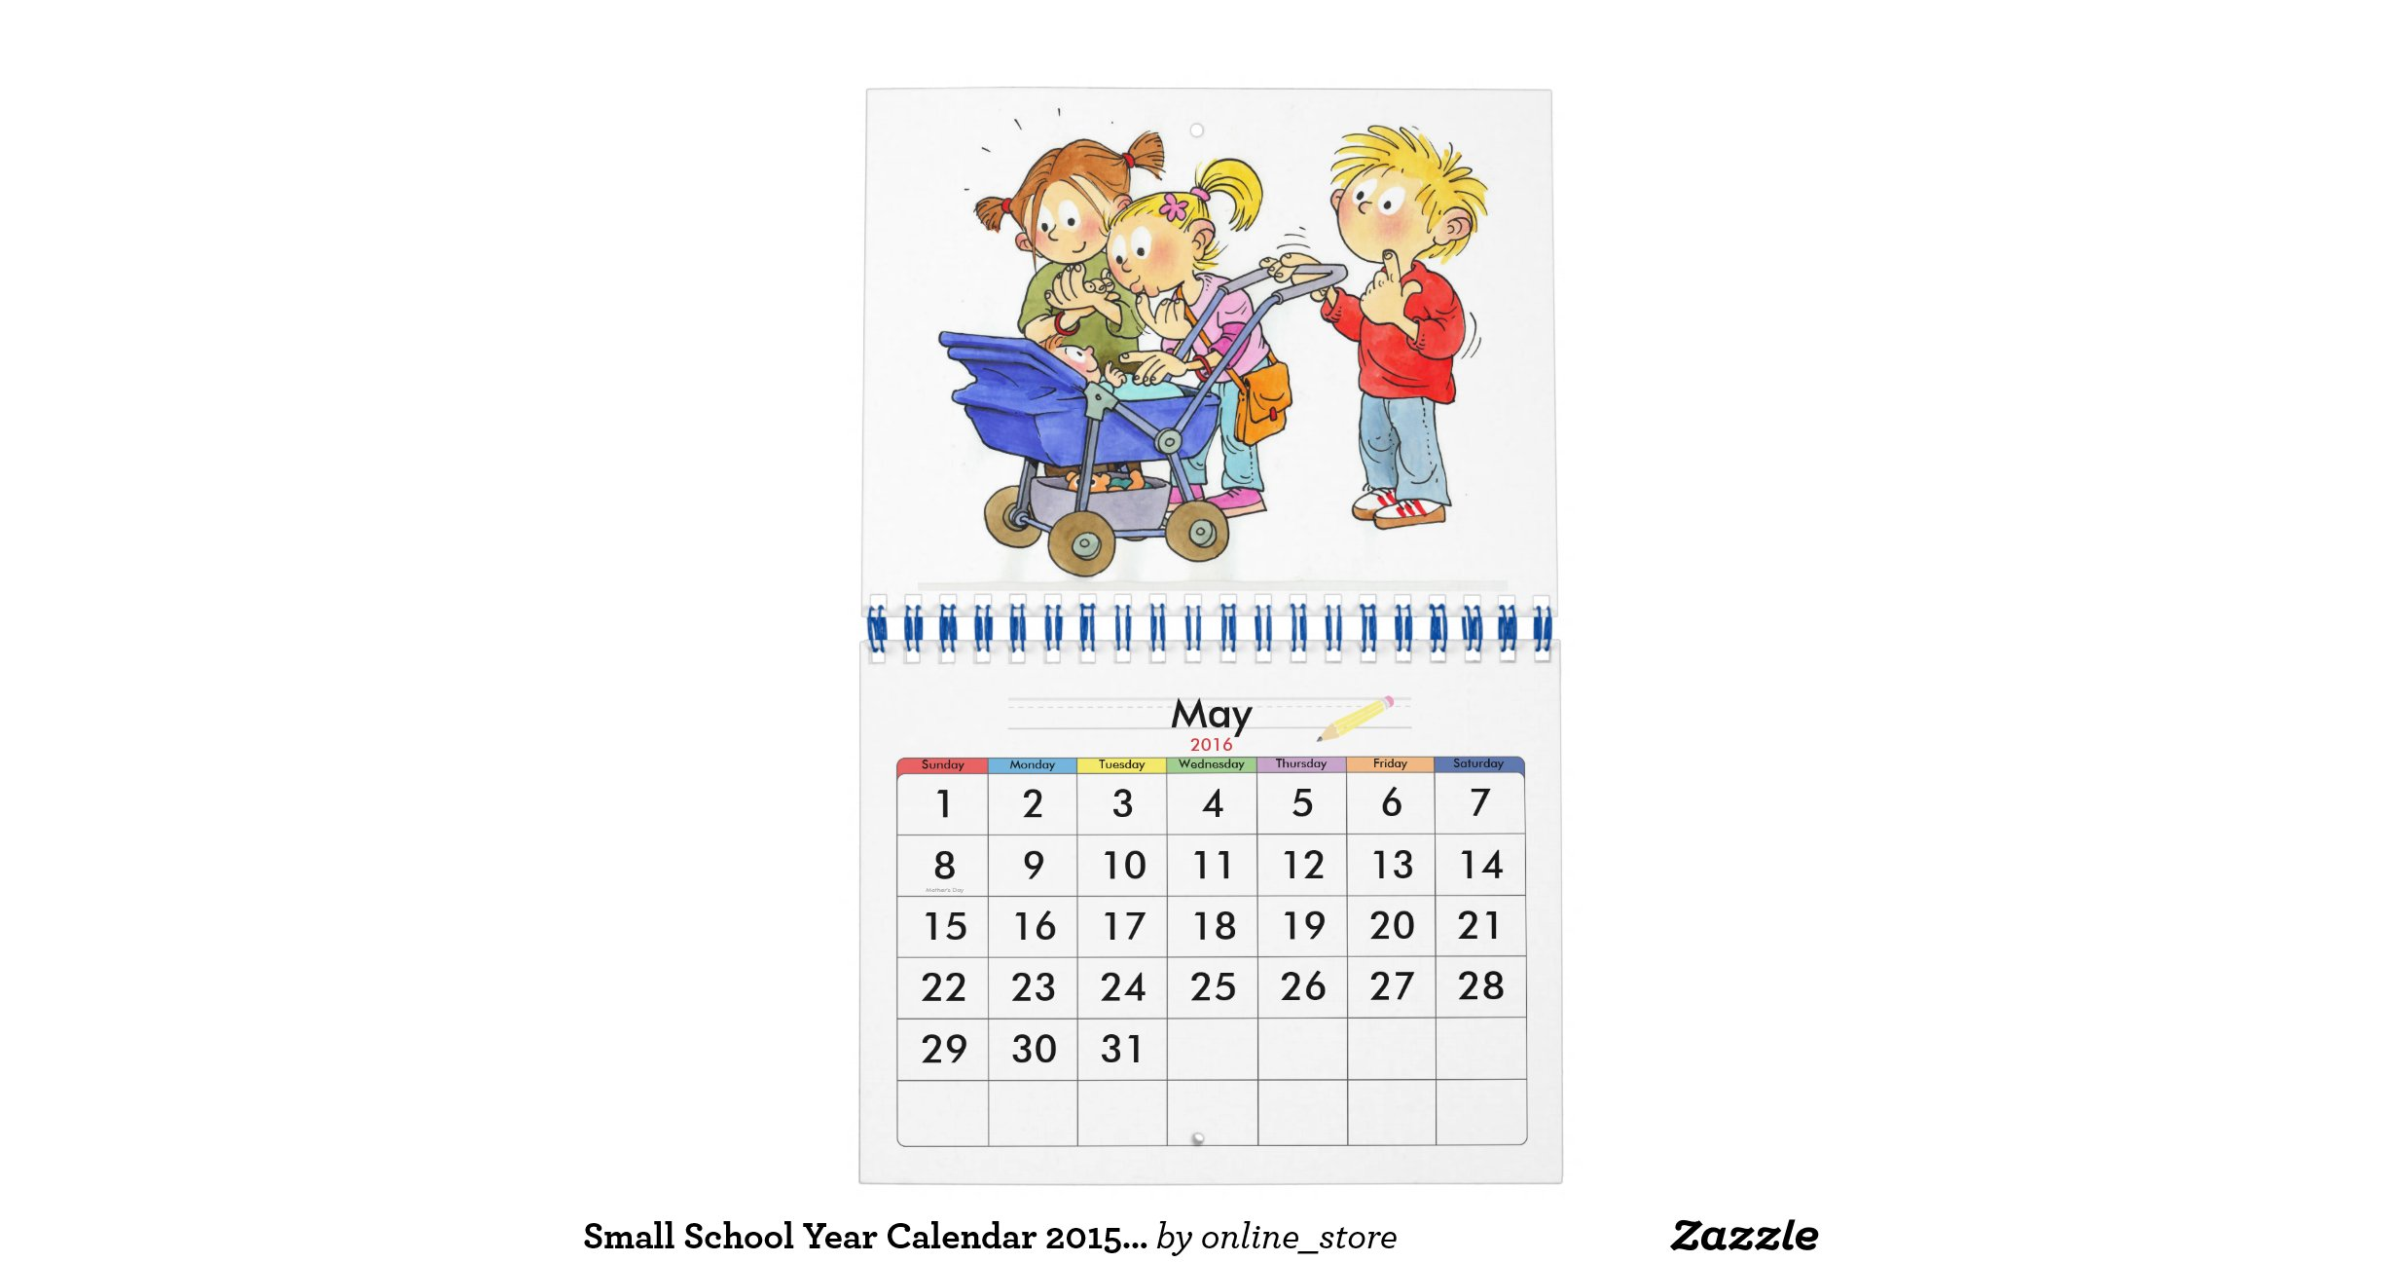 Year Calendar For Kids : Small school year calendar for kids zazzle